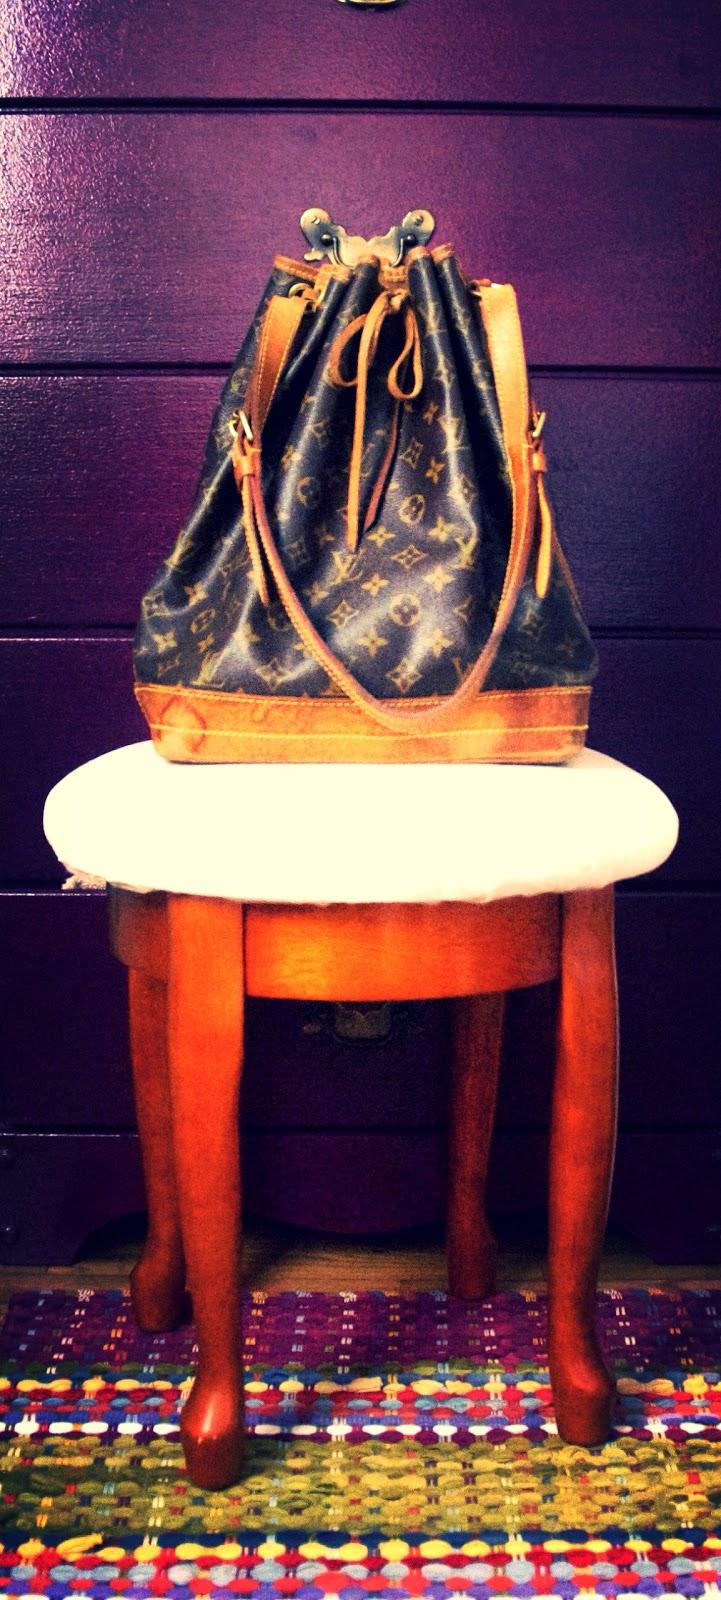 Louis Vuitton Noé handbag vintage